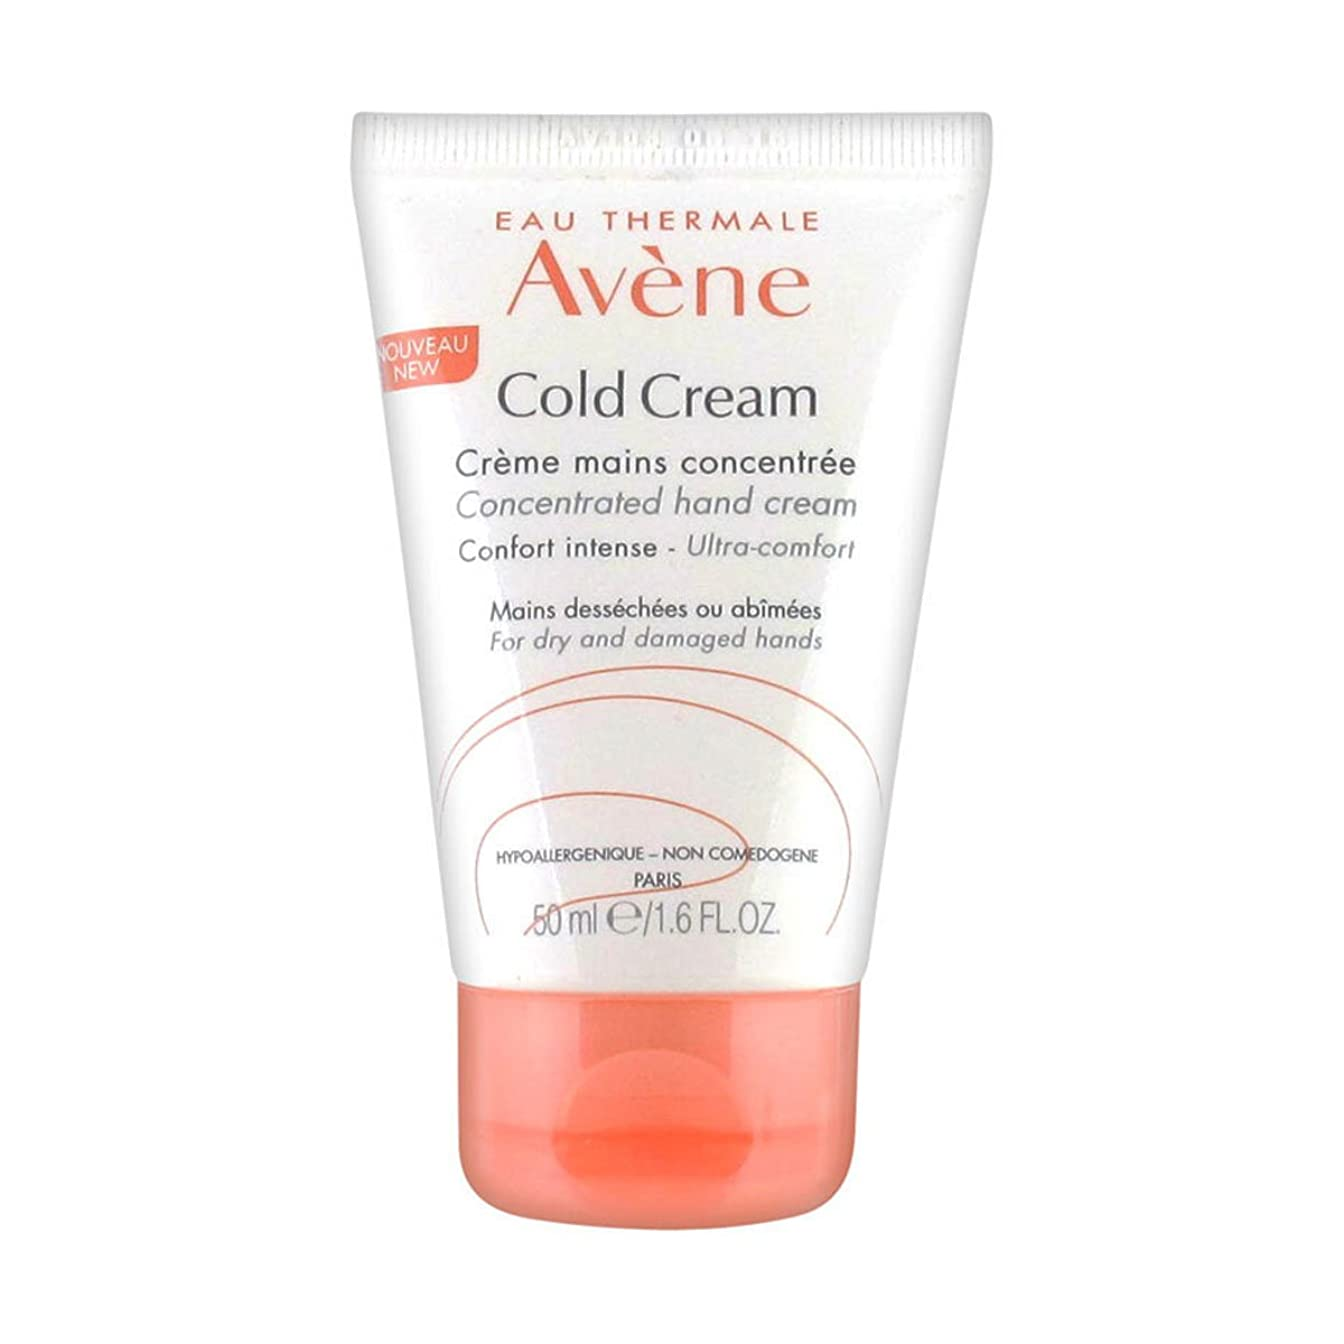 気質贅沢貢献Avene Cold Cream Hand Cream 50ml [並行輸入品]